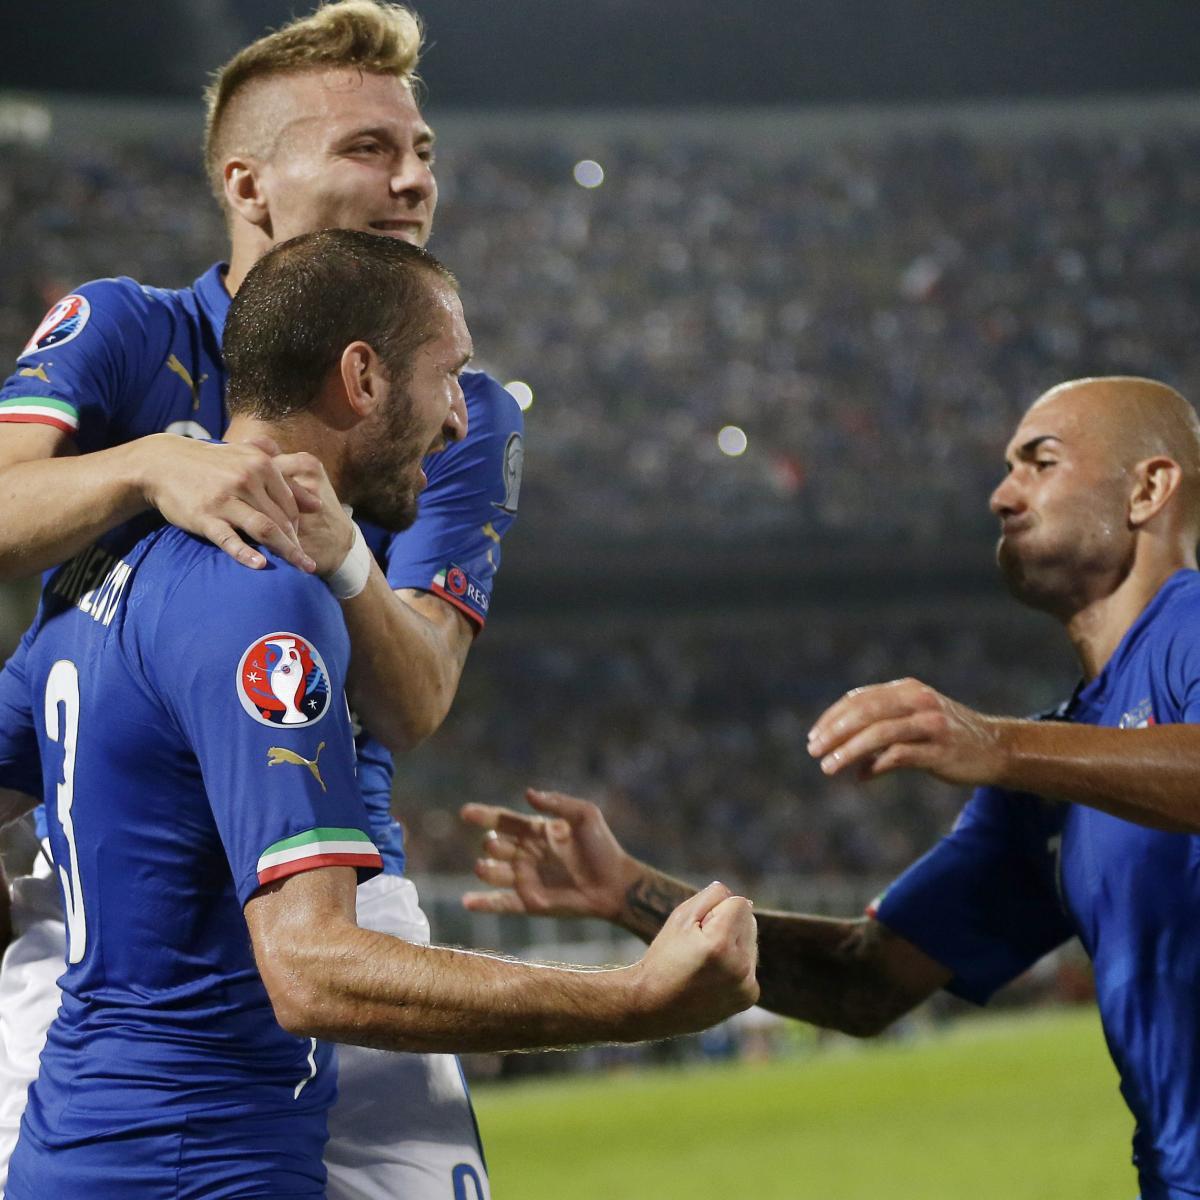 Azerbaijan News And Scores: Italy Vs. Azerbaijan: Score, Grades And Reaction From Euro